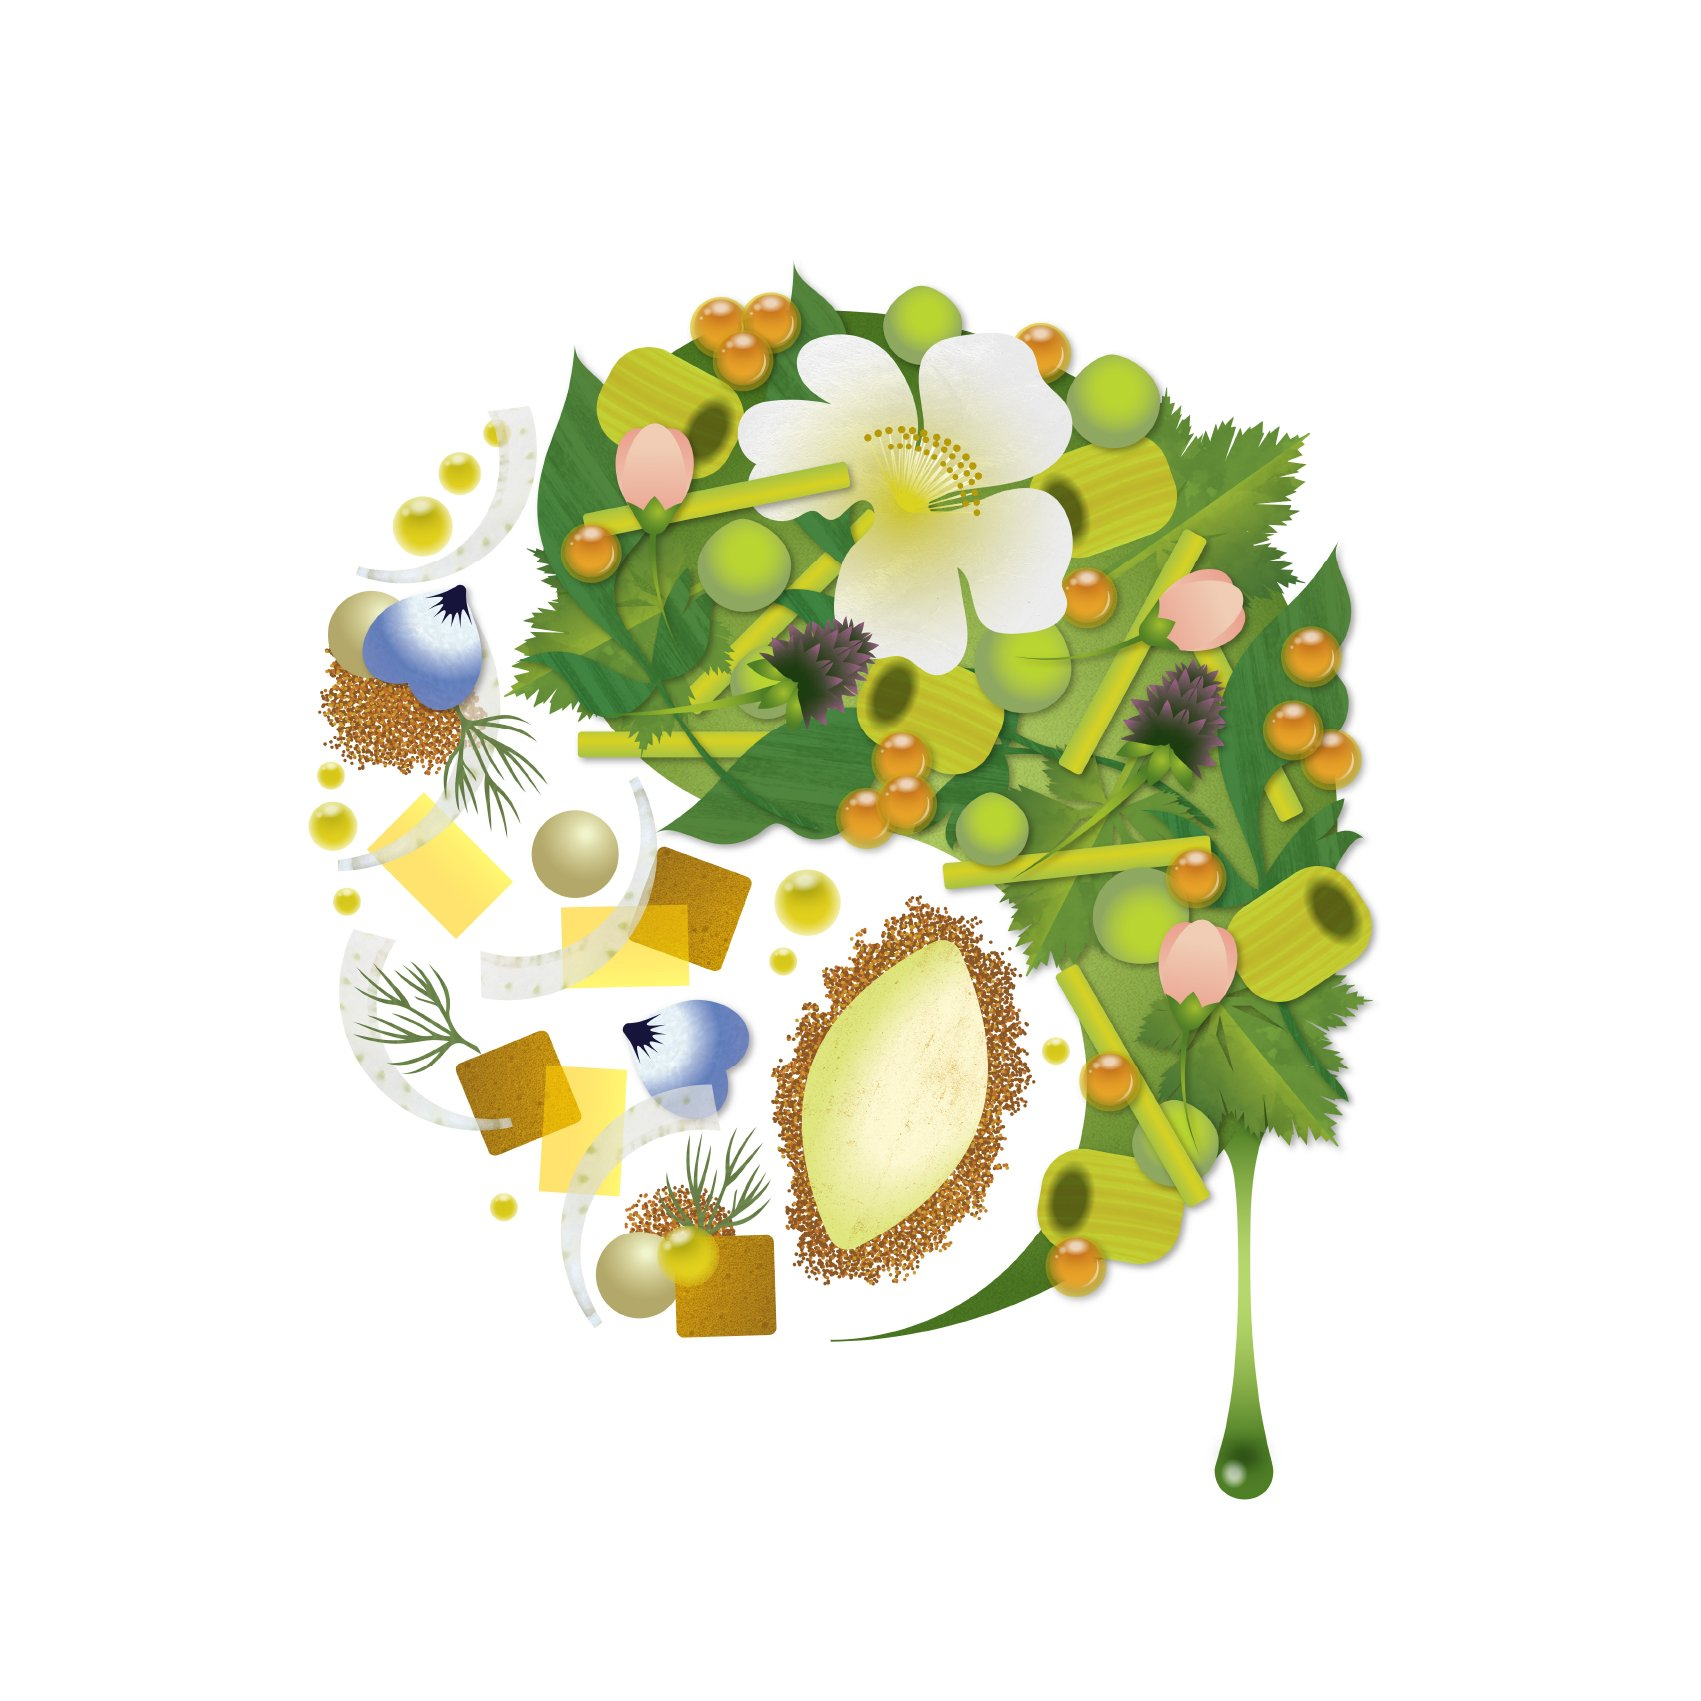 Sublime food design ricette in cibografica 19